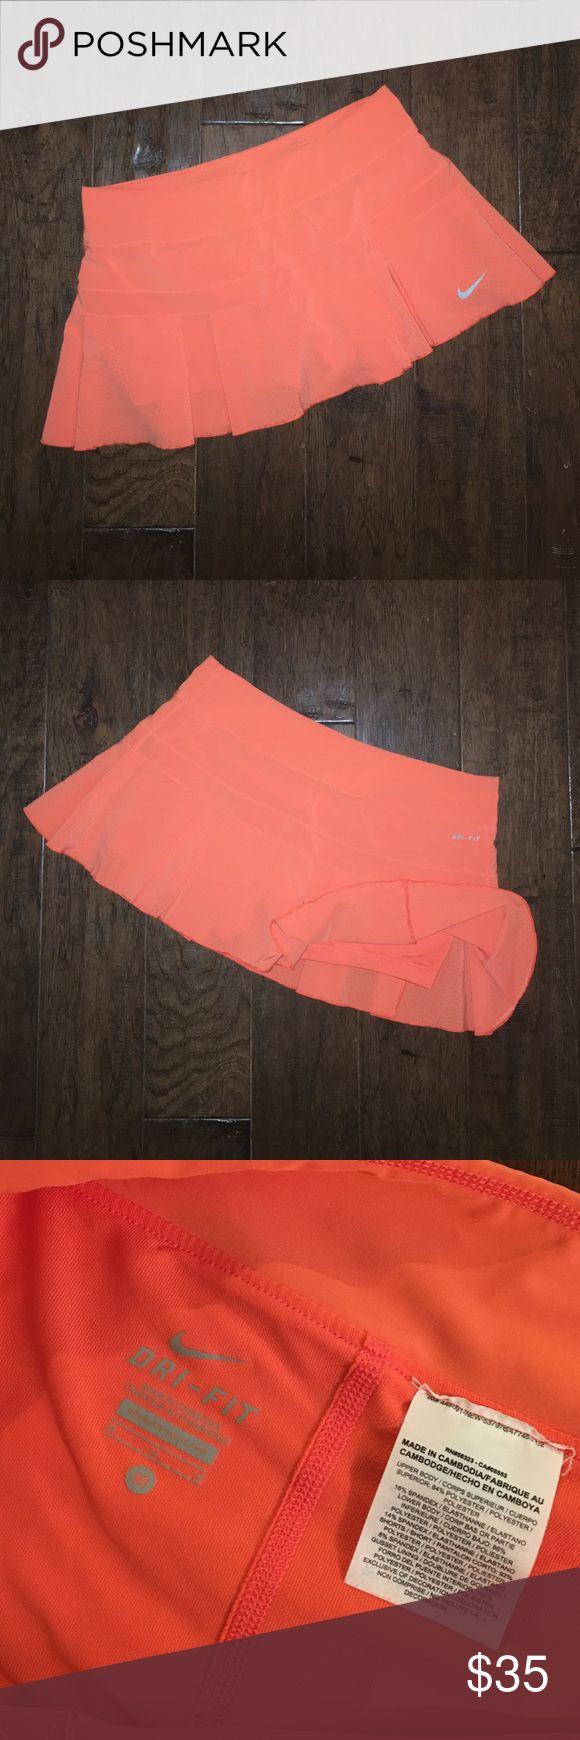 Nike Women's Tennis skort Nike Orange tennis skort with built-in compression shorts. Nike Shorts Skorts